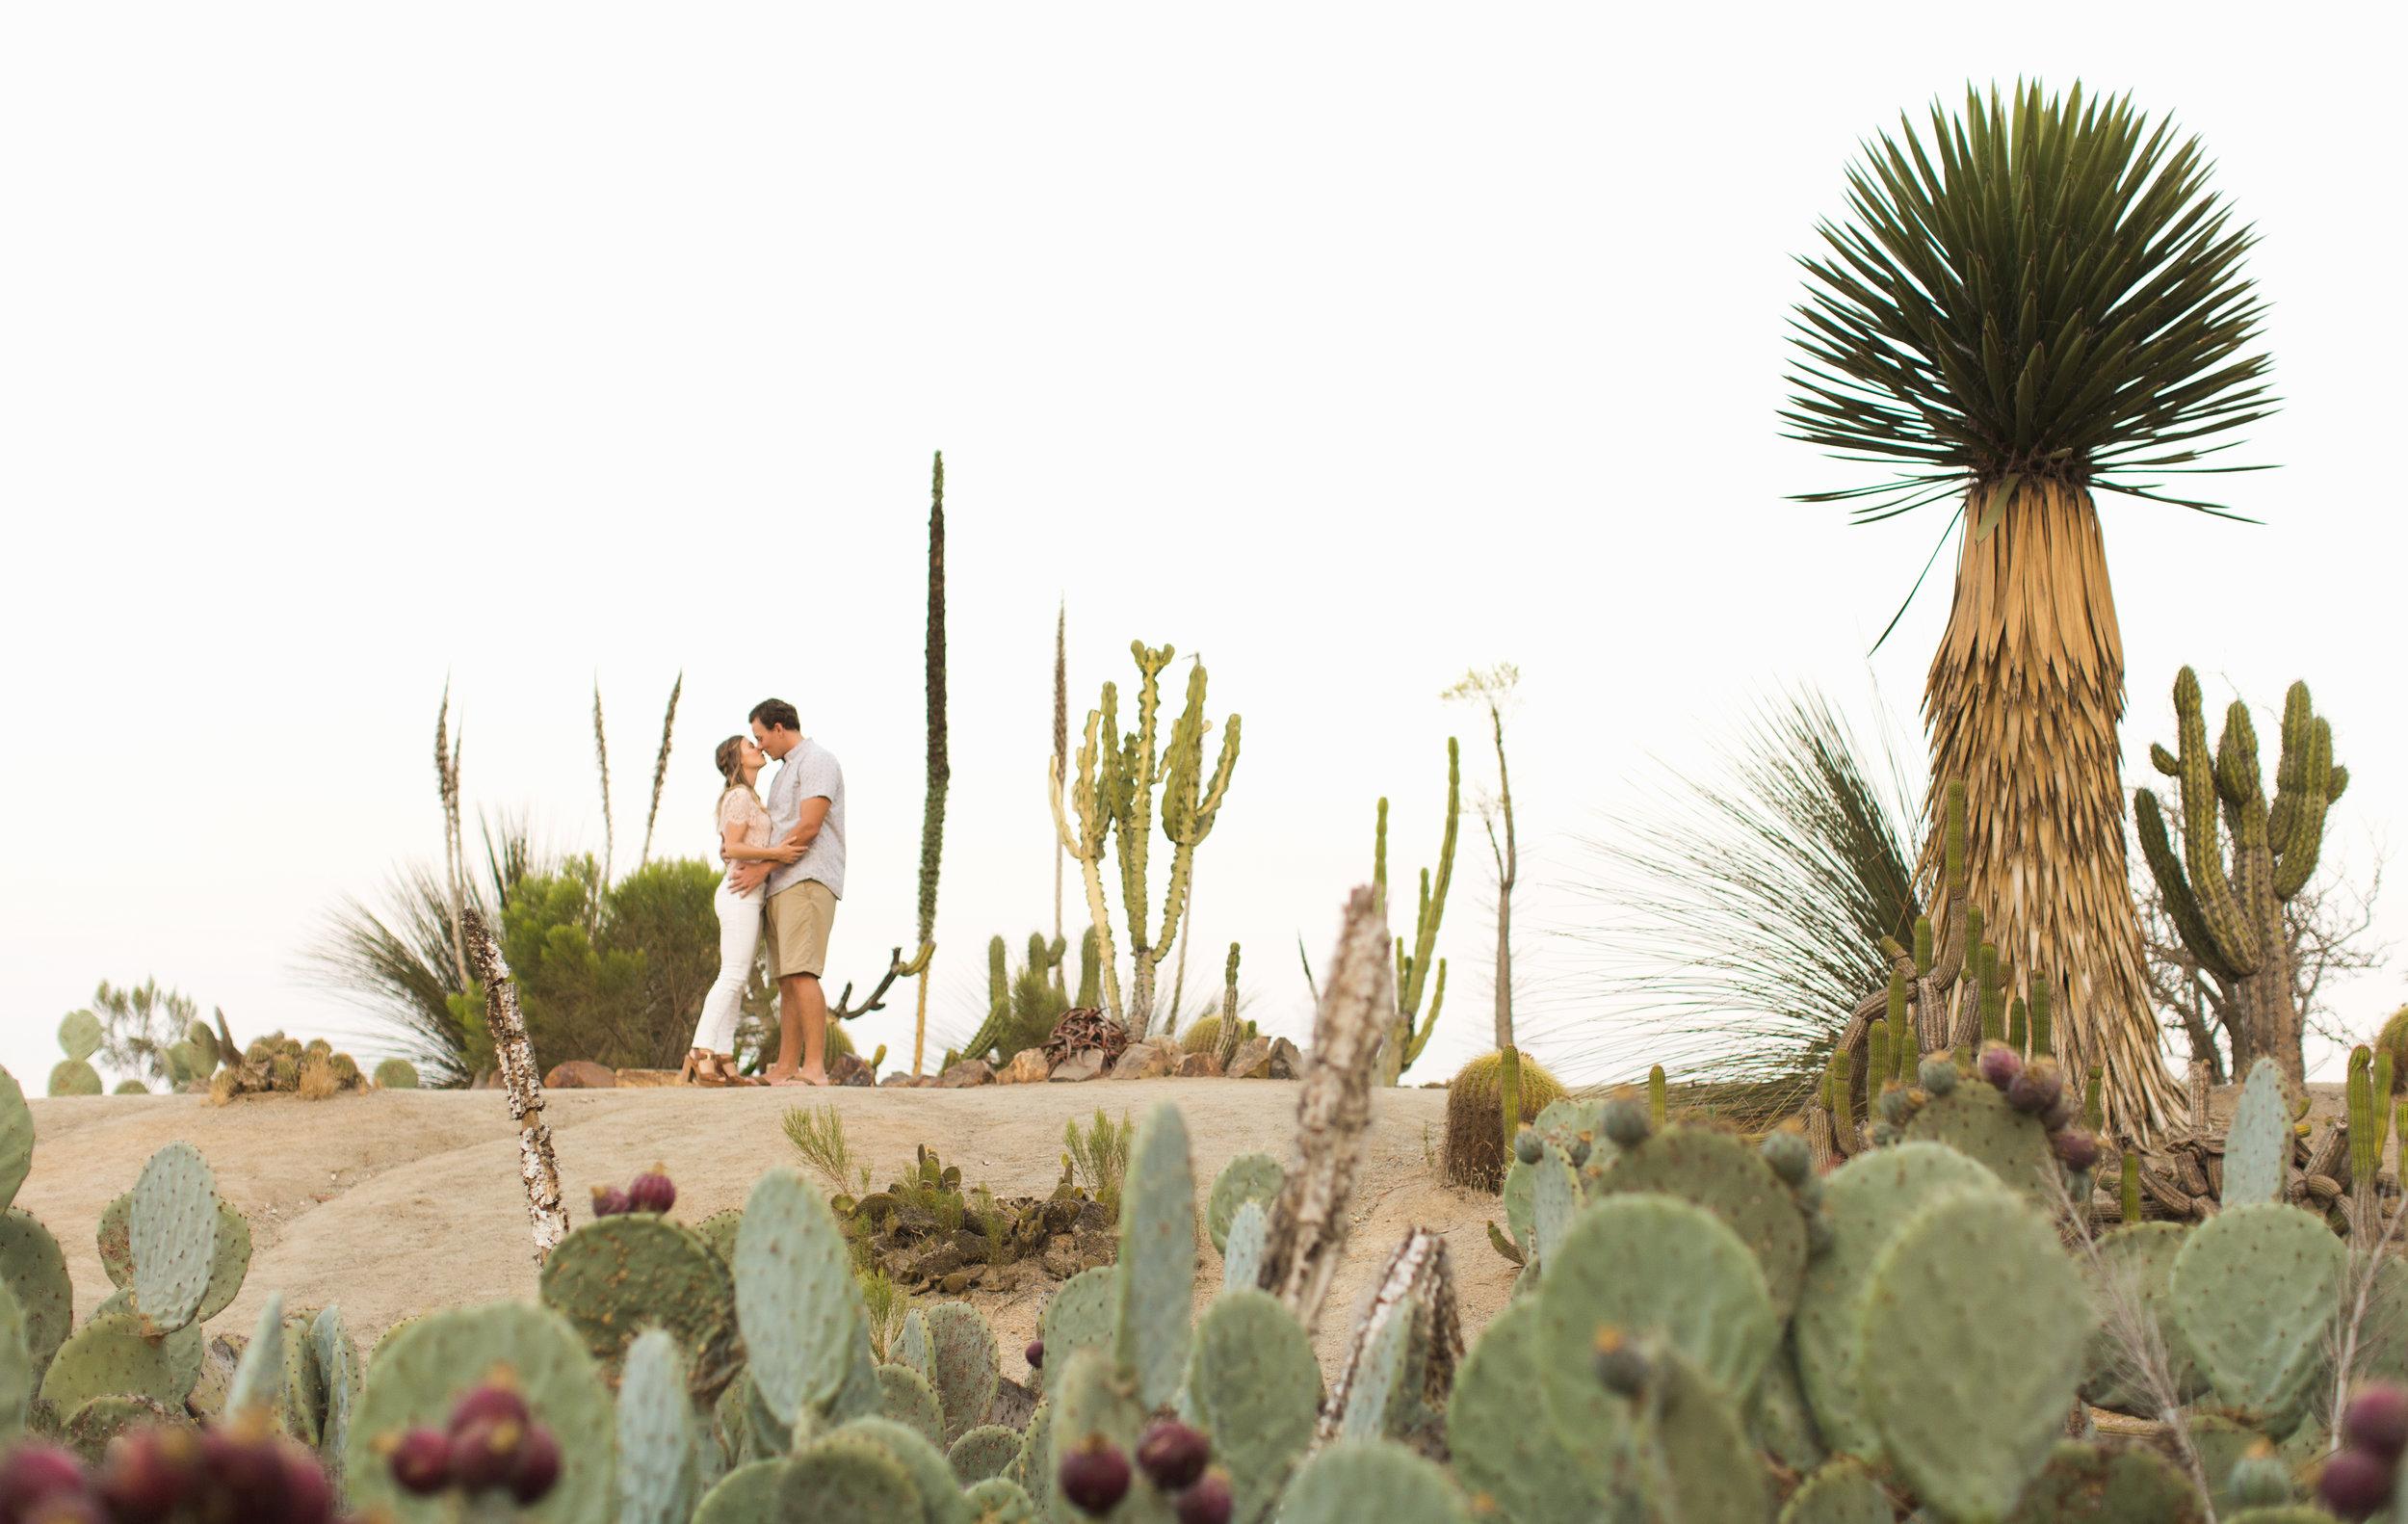 1000.Shewanders.photography.balboa.engagement-1359.jpg